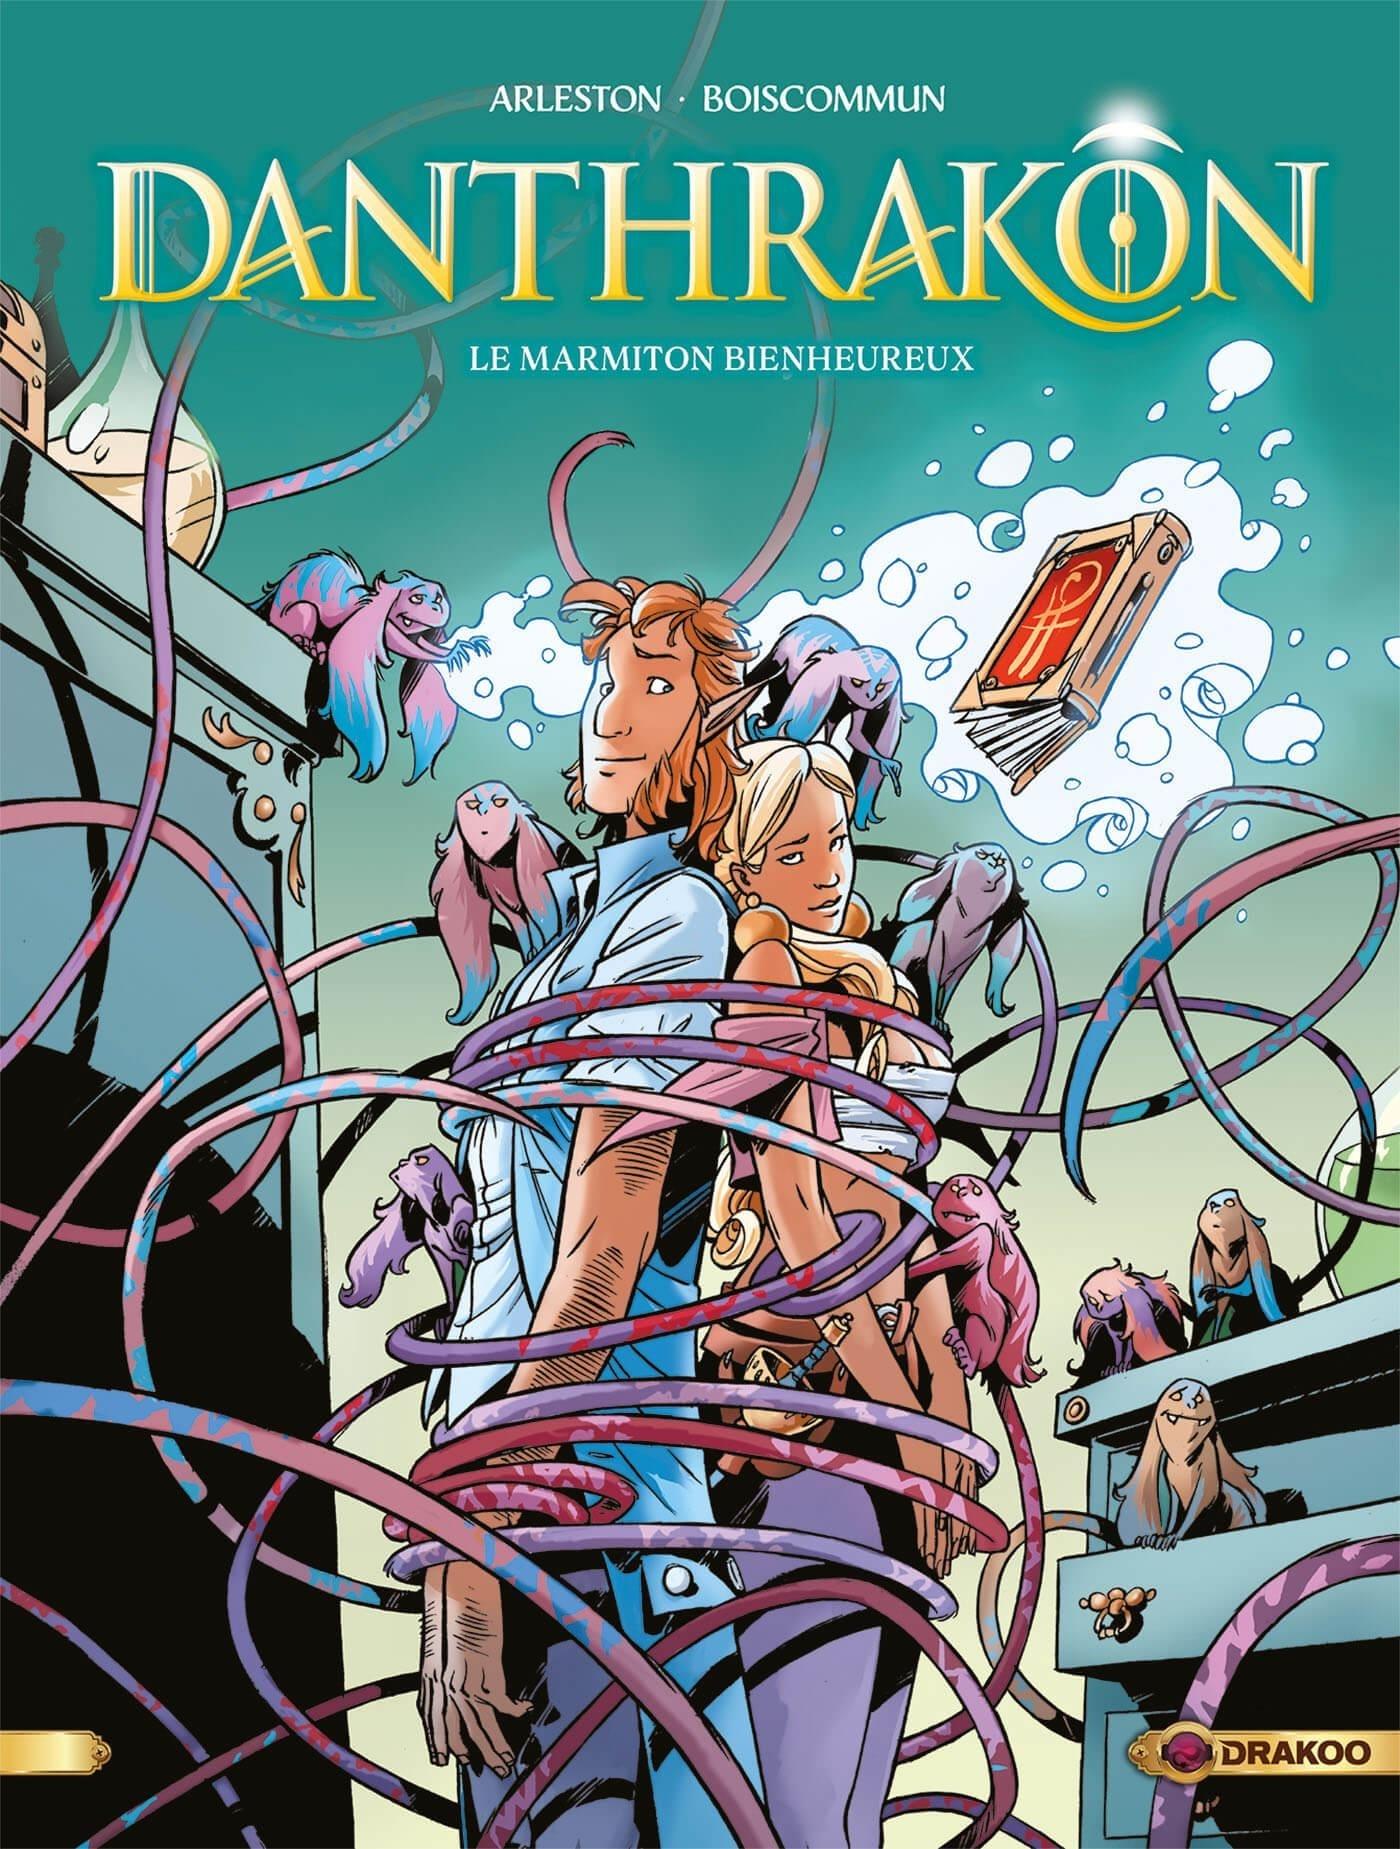 DANTHRAKON - T03 - DANTHRAKON - VOLUME 03 - LE MARMITON BIENHEUREUX